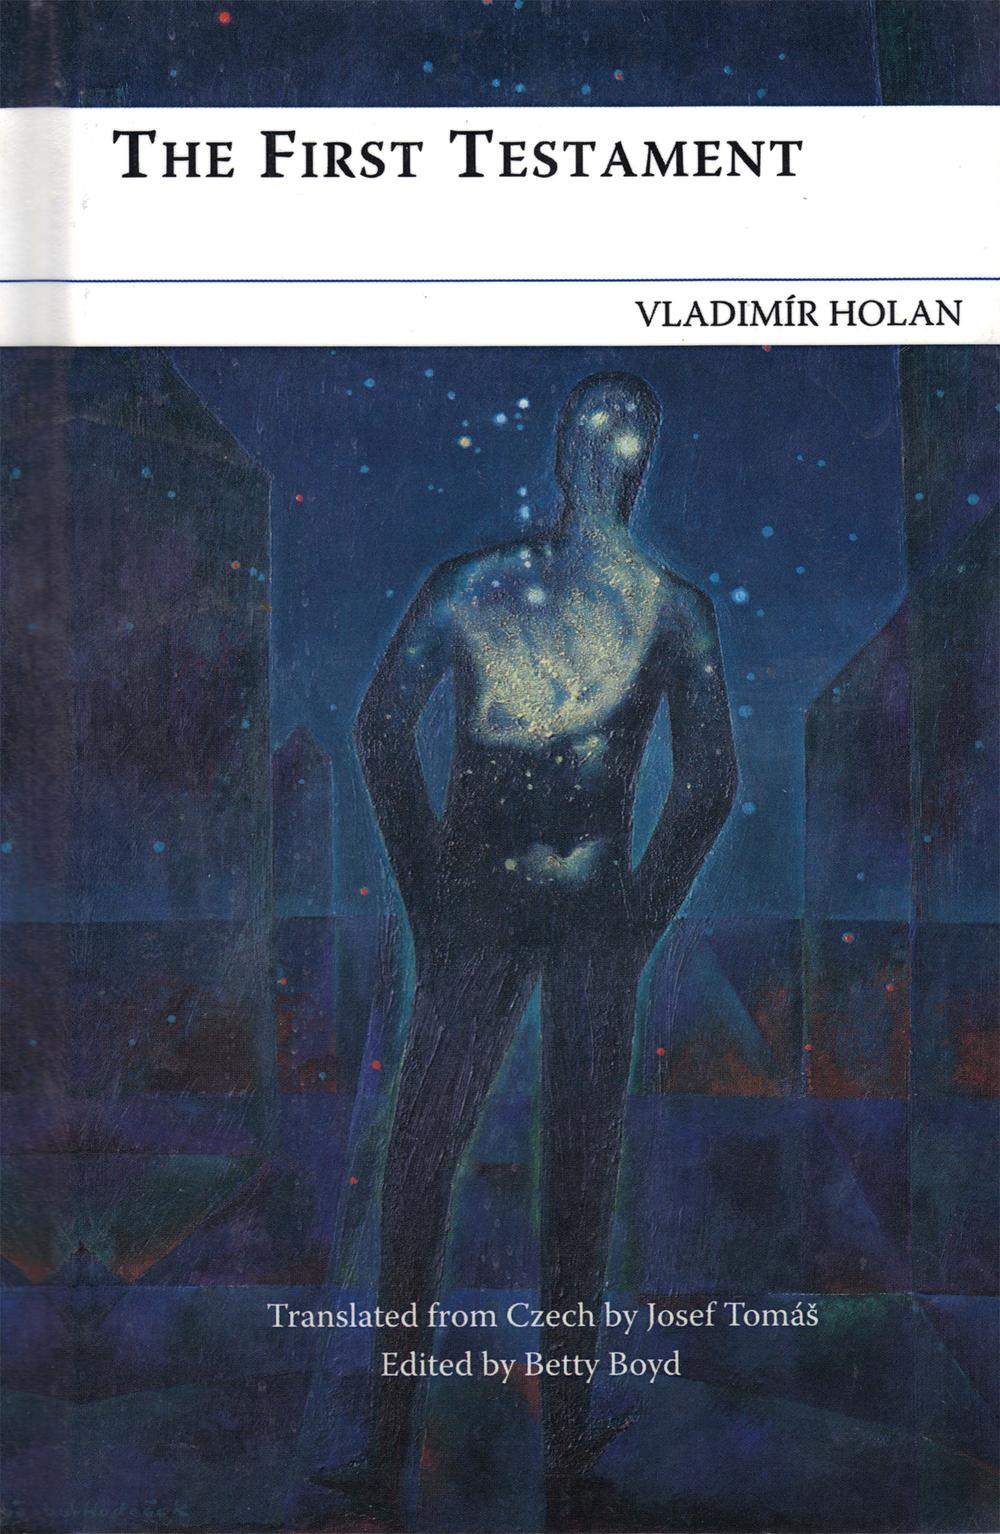 The first testament_Holan